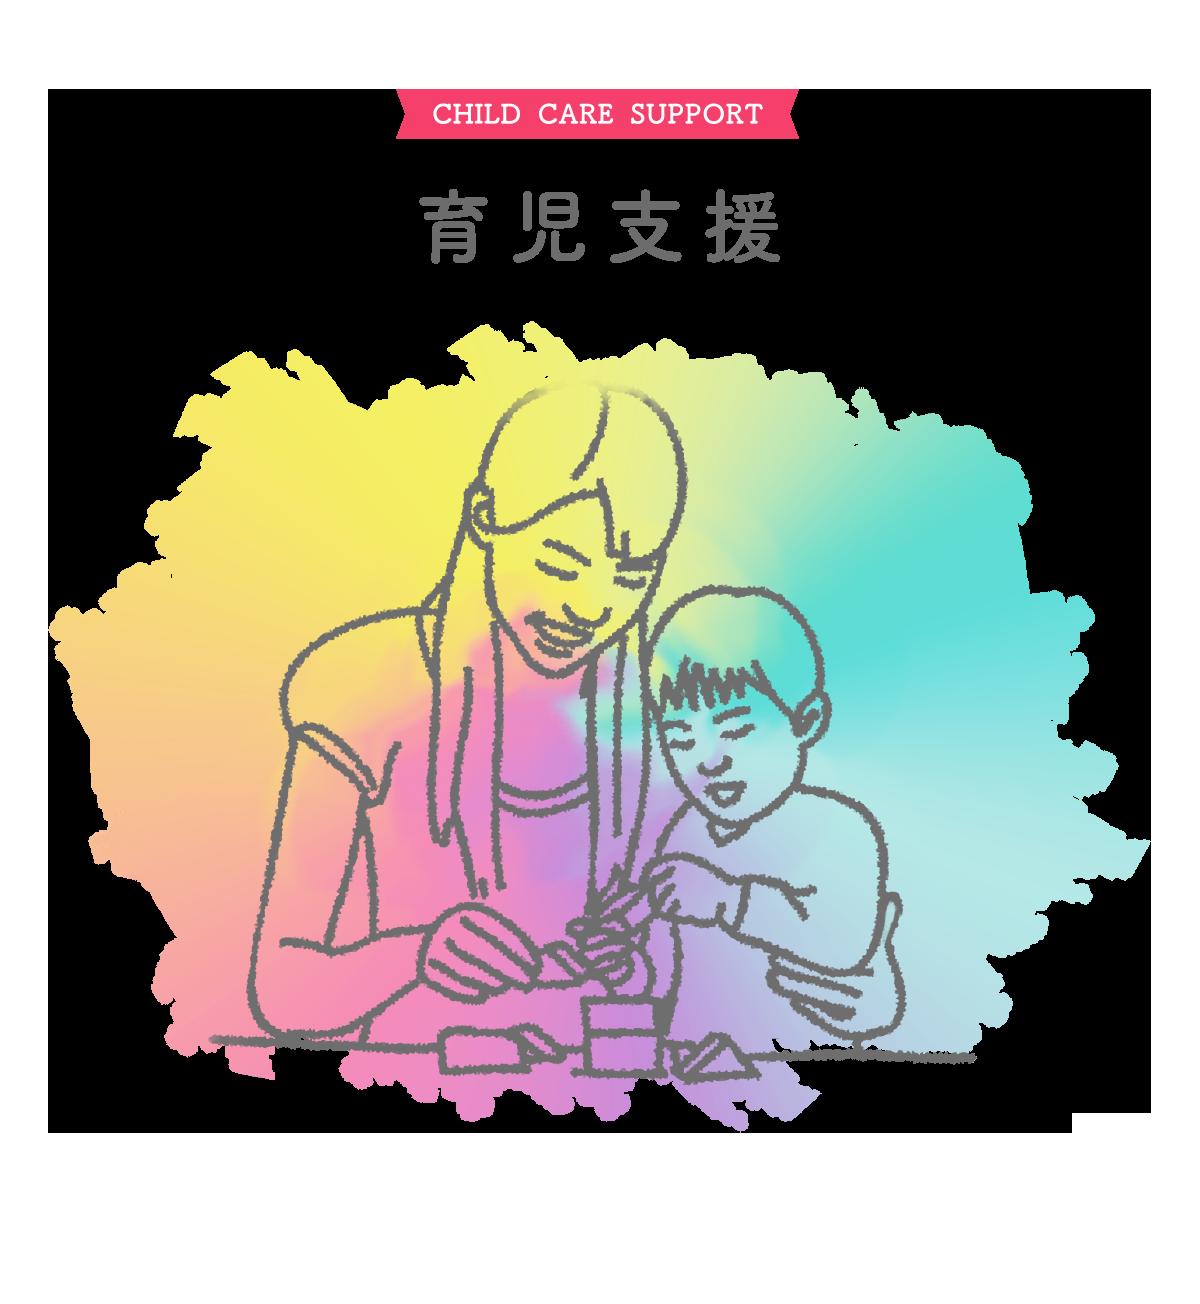 sp育児支援ヘッダー画像